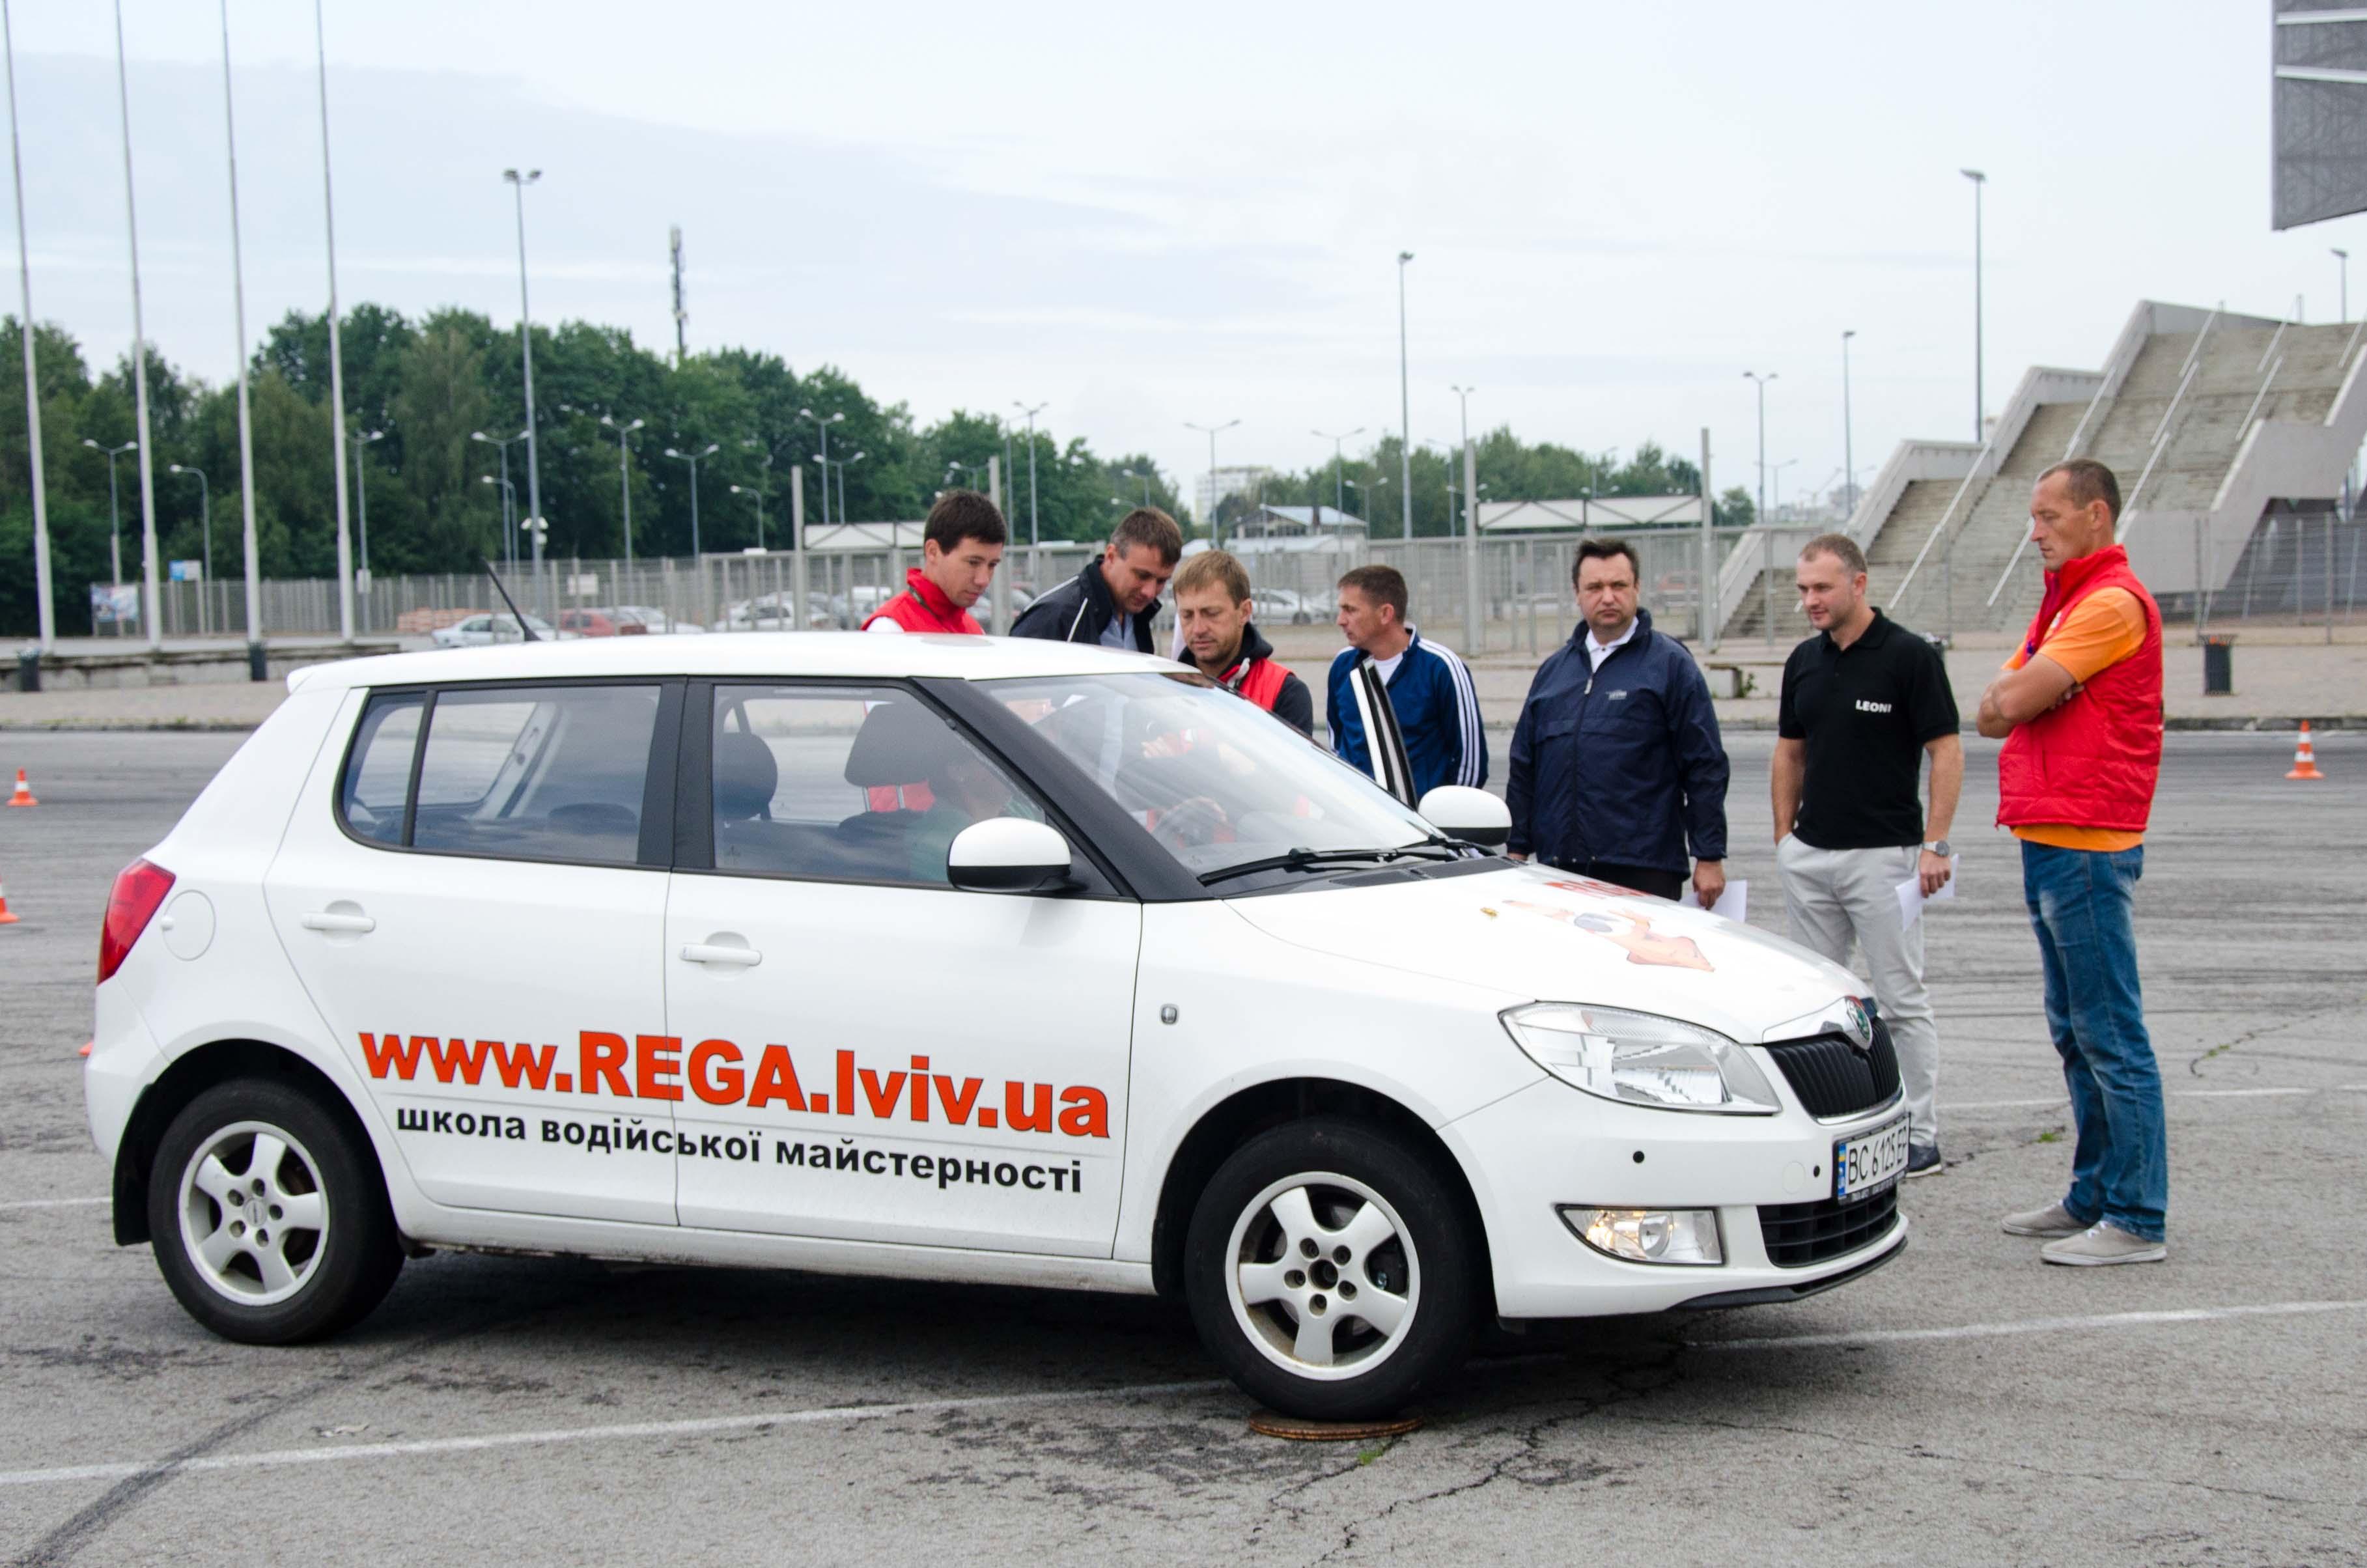 Rega Leoni Wiring System Systems